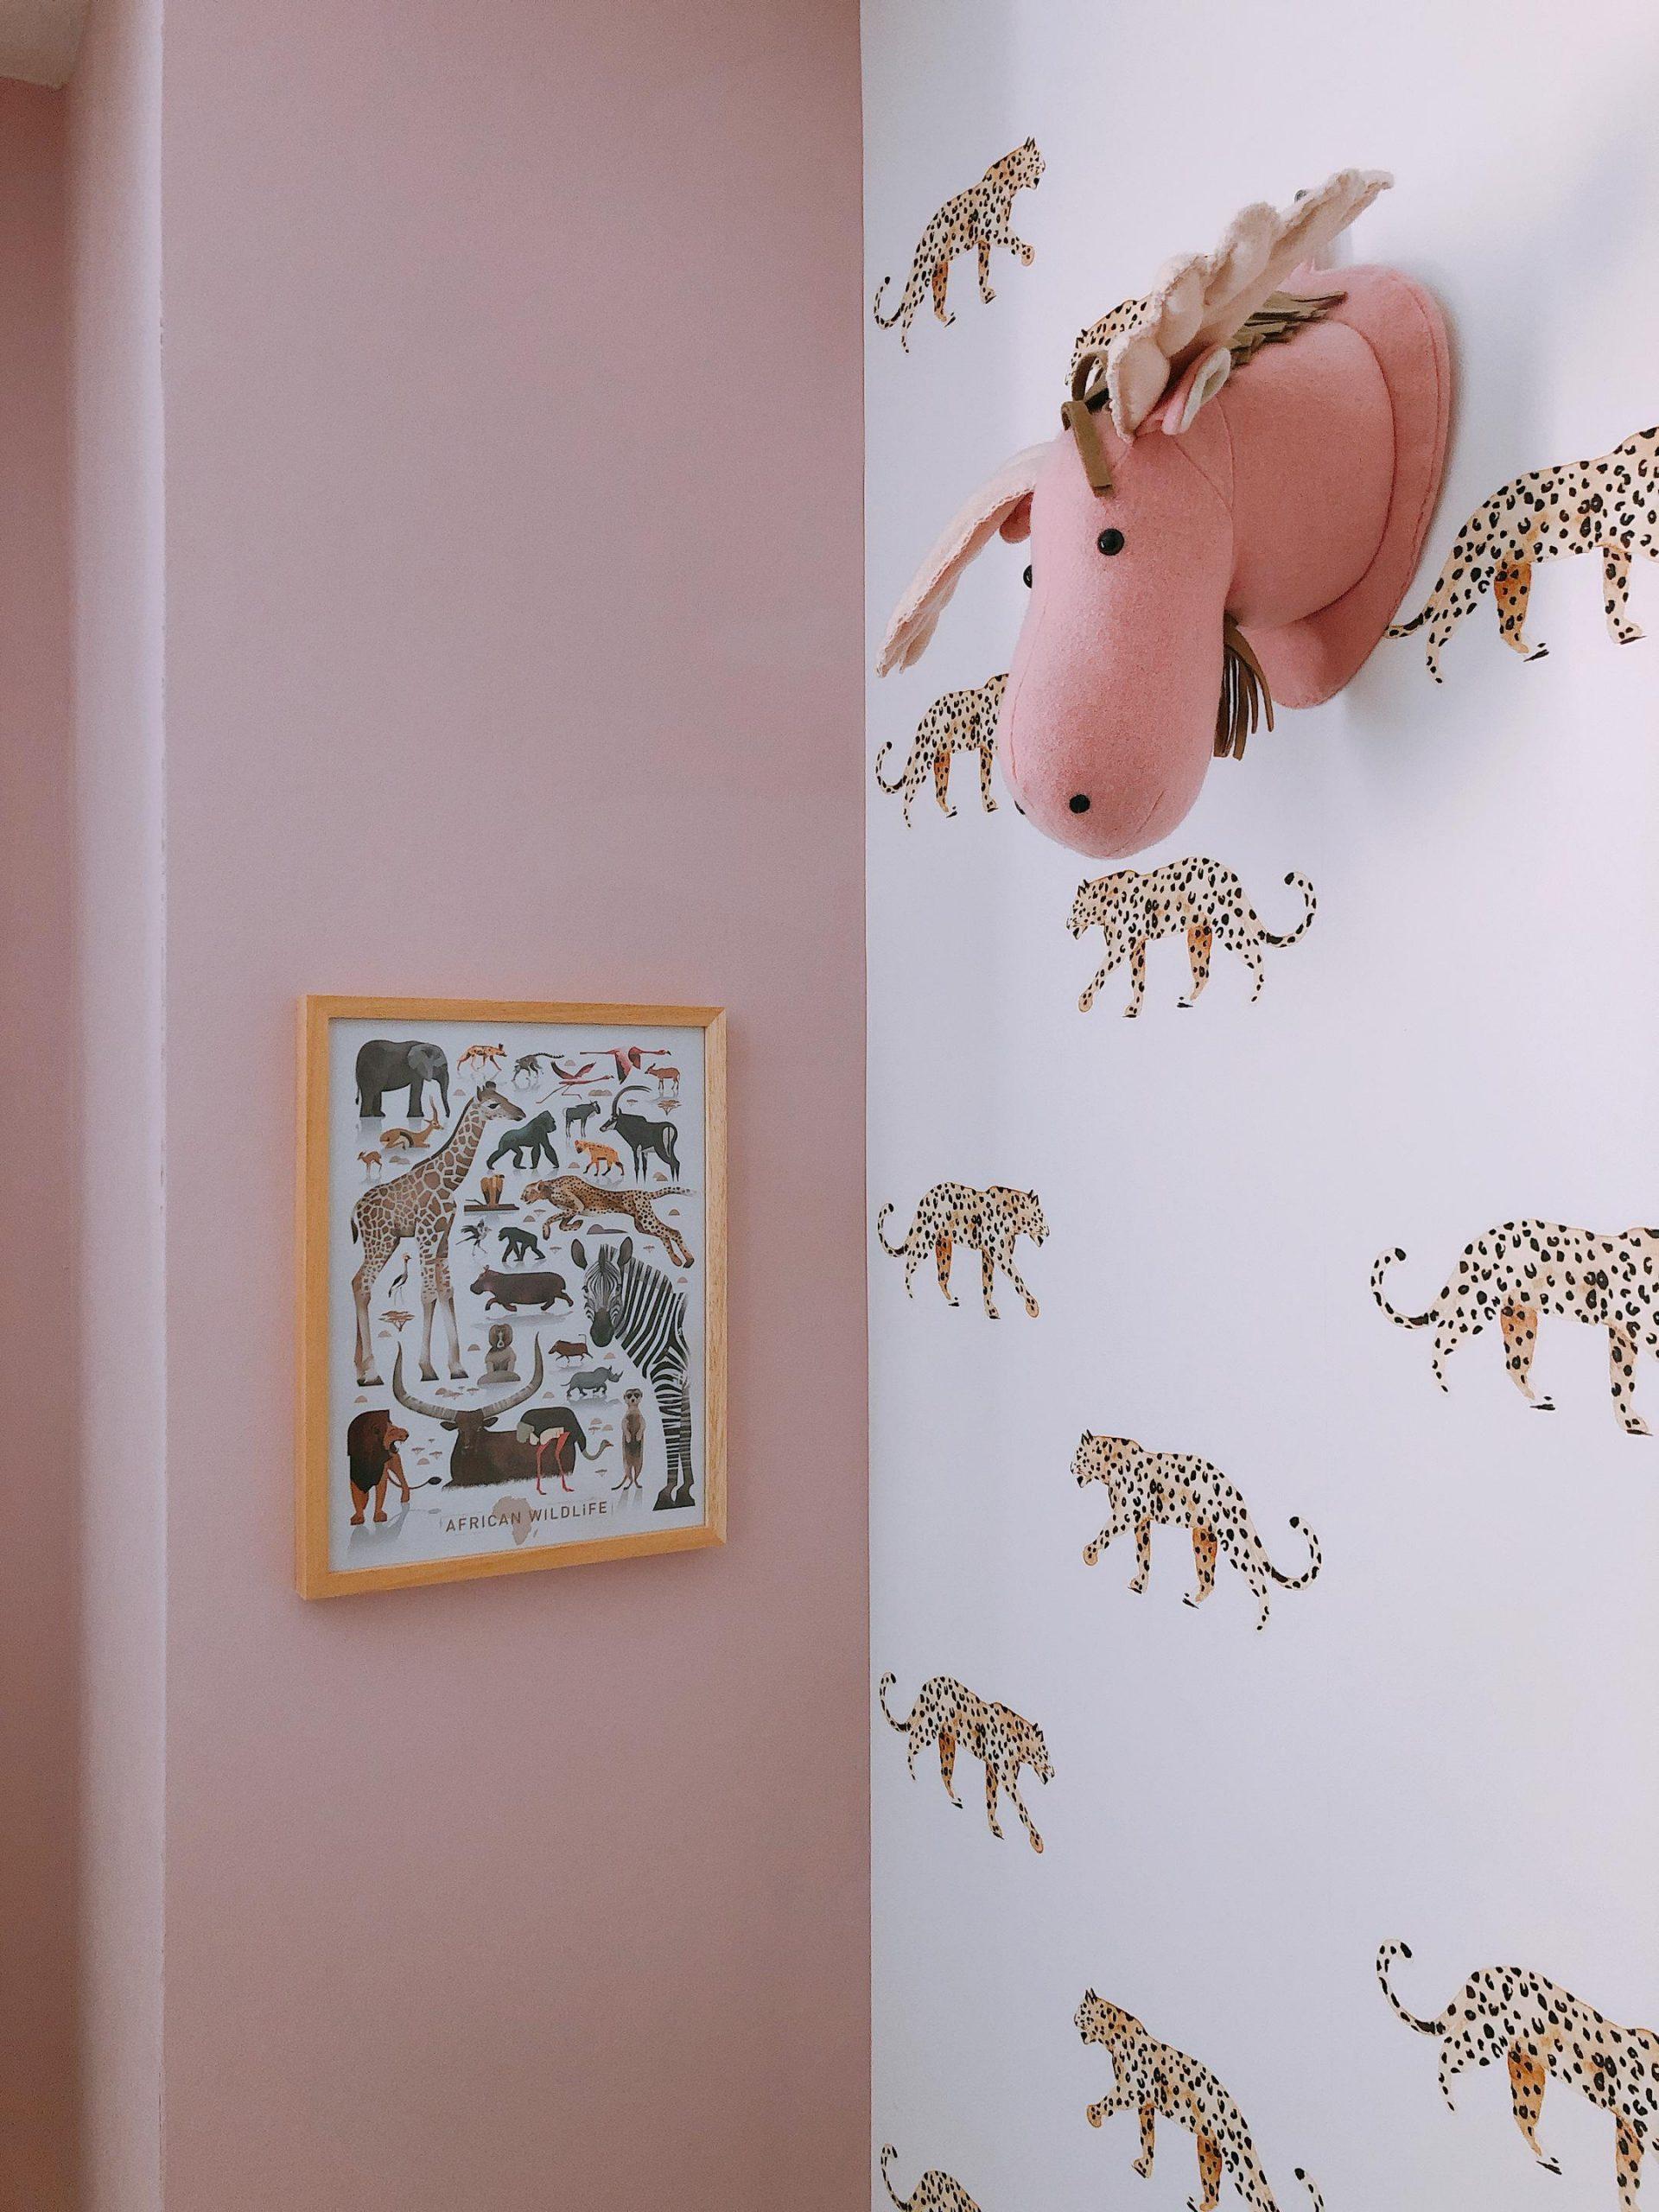 IMG 6858 2160x2880 2 scaled - De baby/kinderkamer van Hazel - roze, hout & marmer!